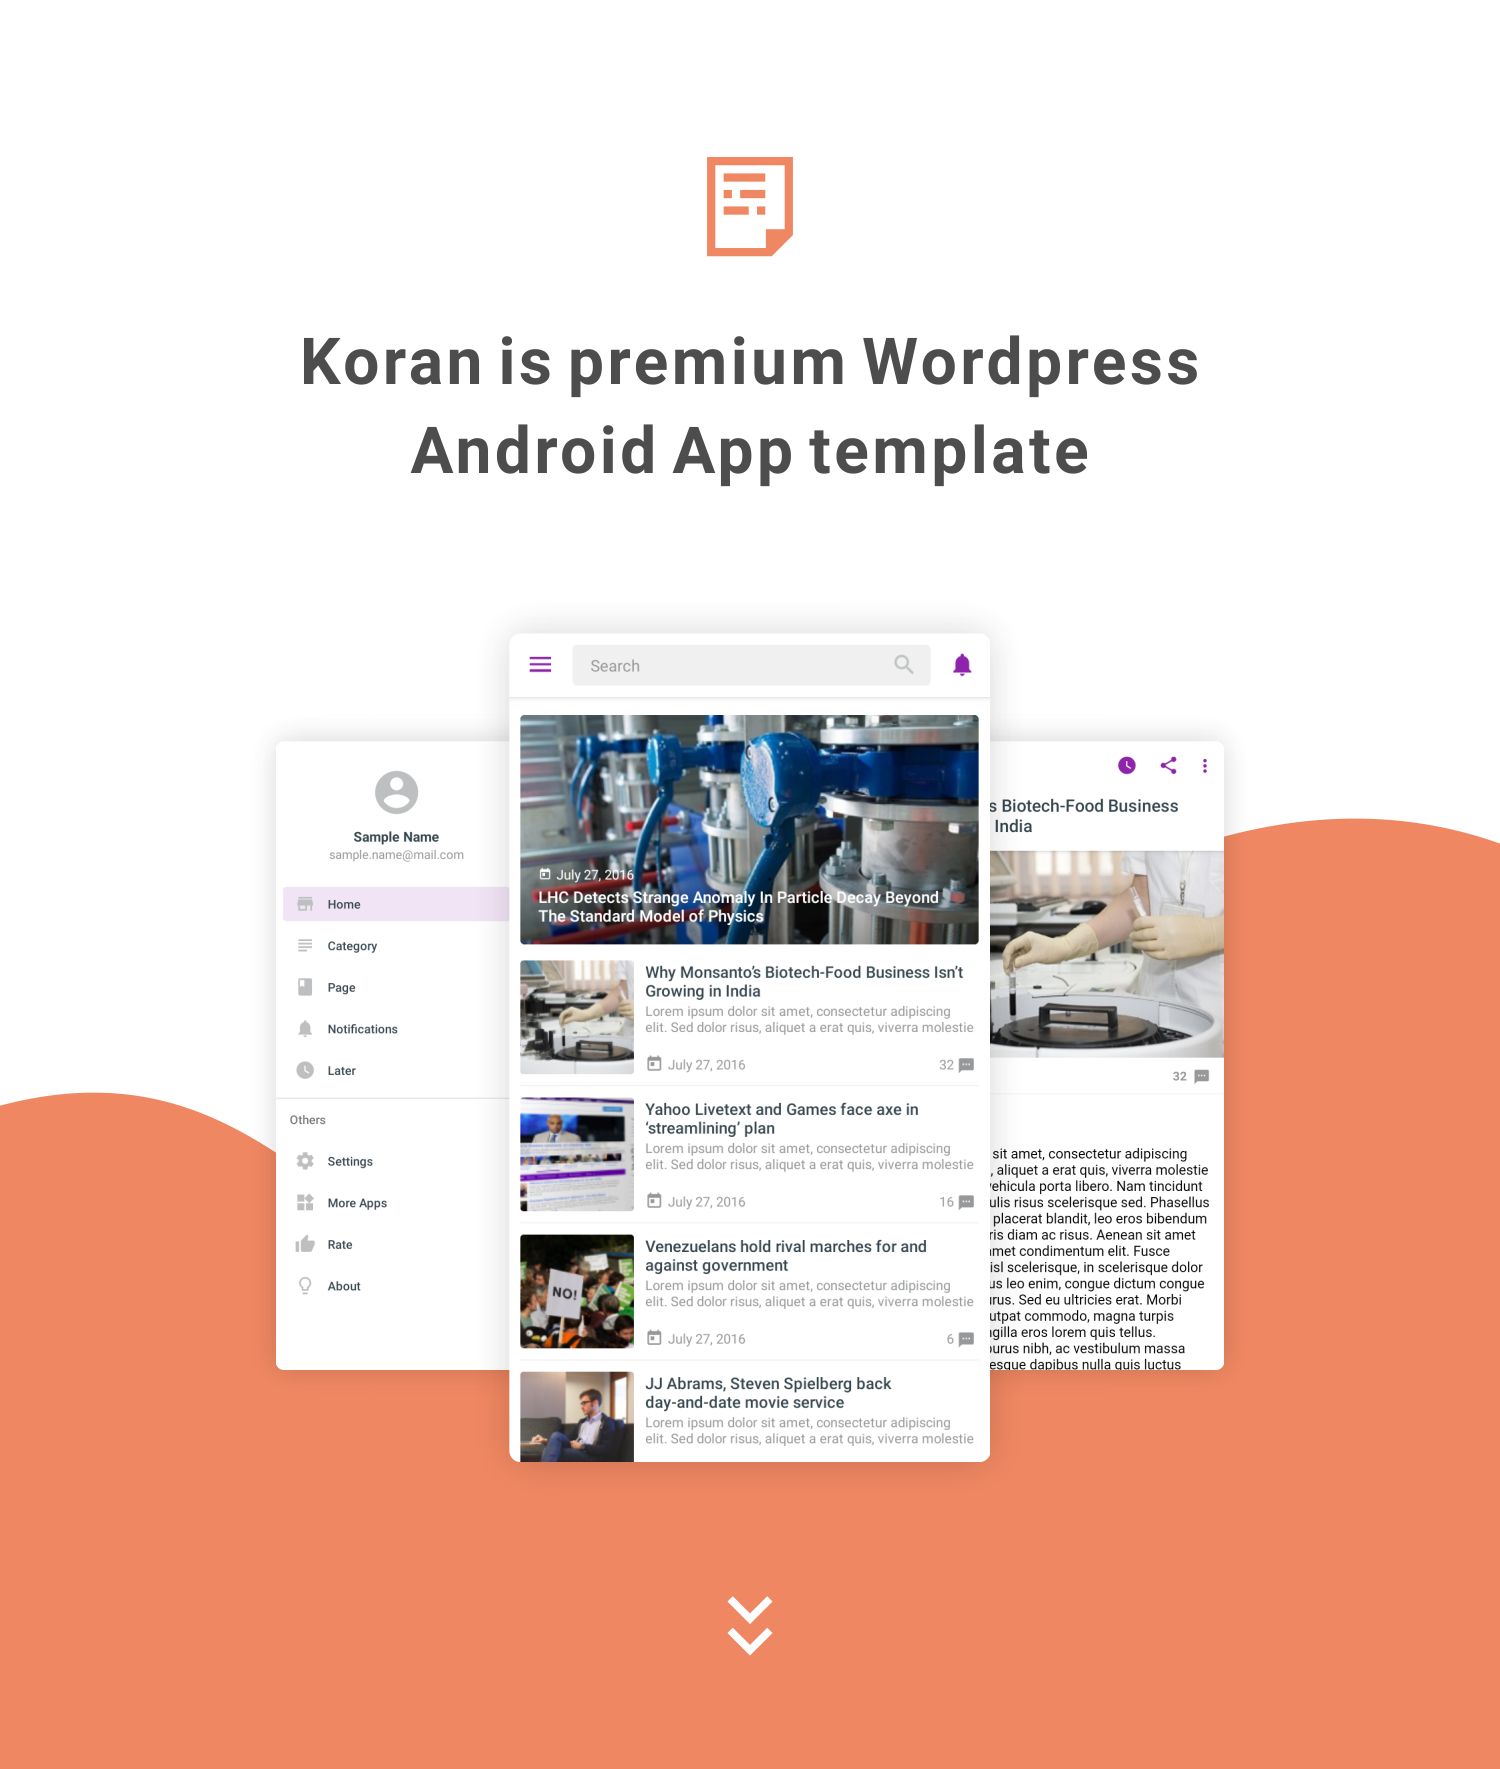 Koran - WordPress Android Application 5.0 - 1